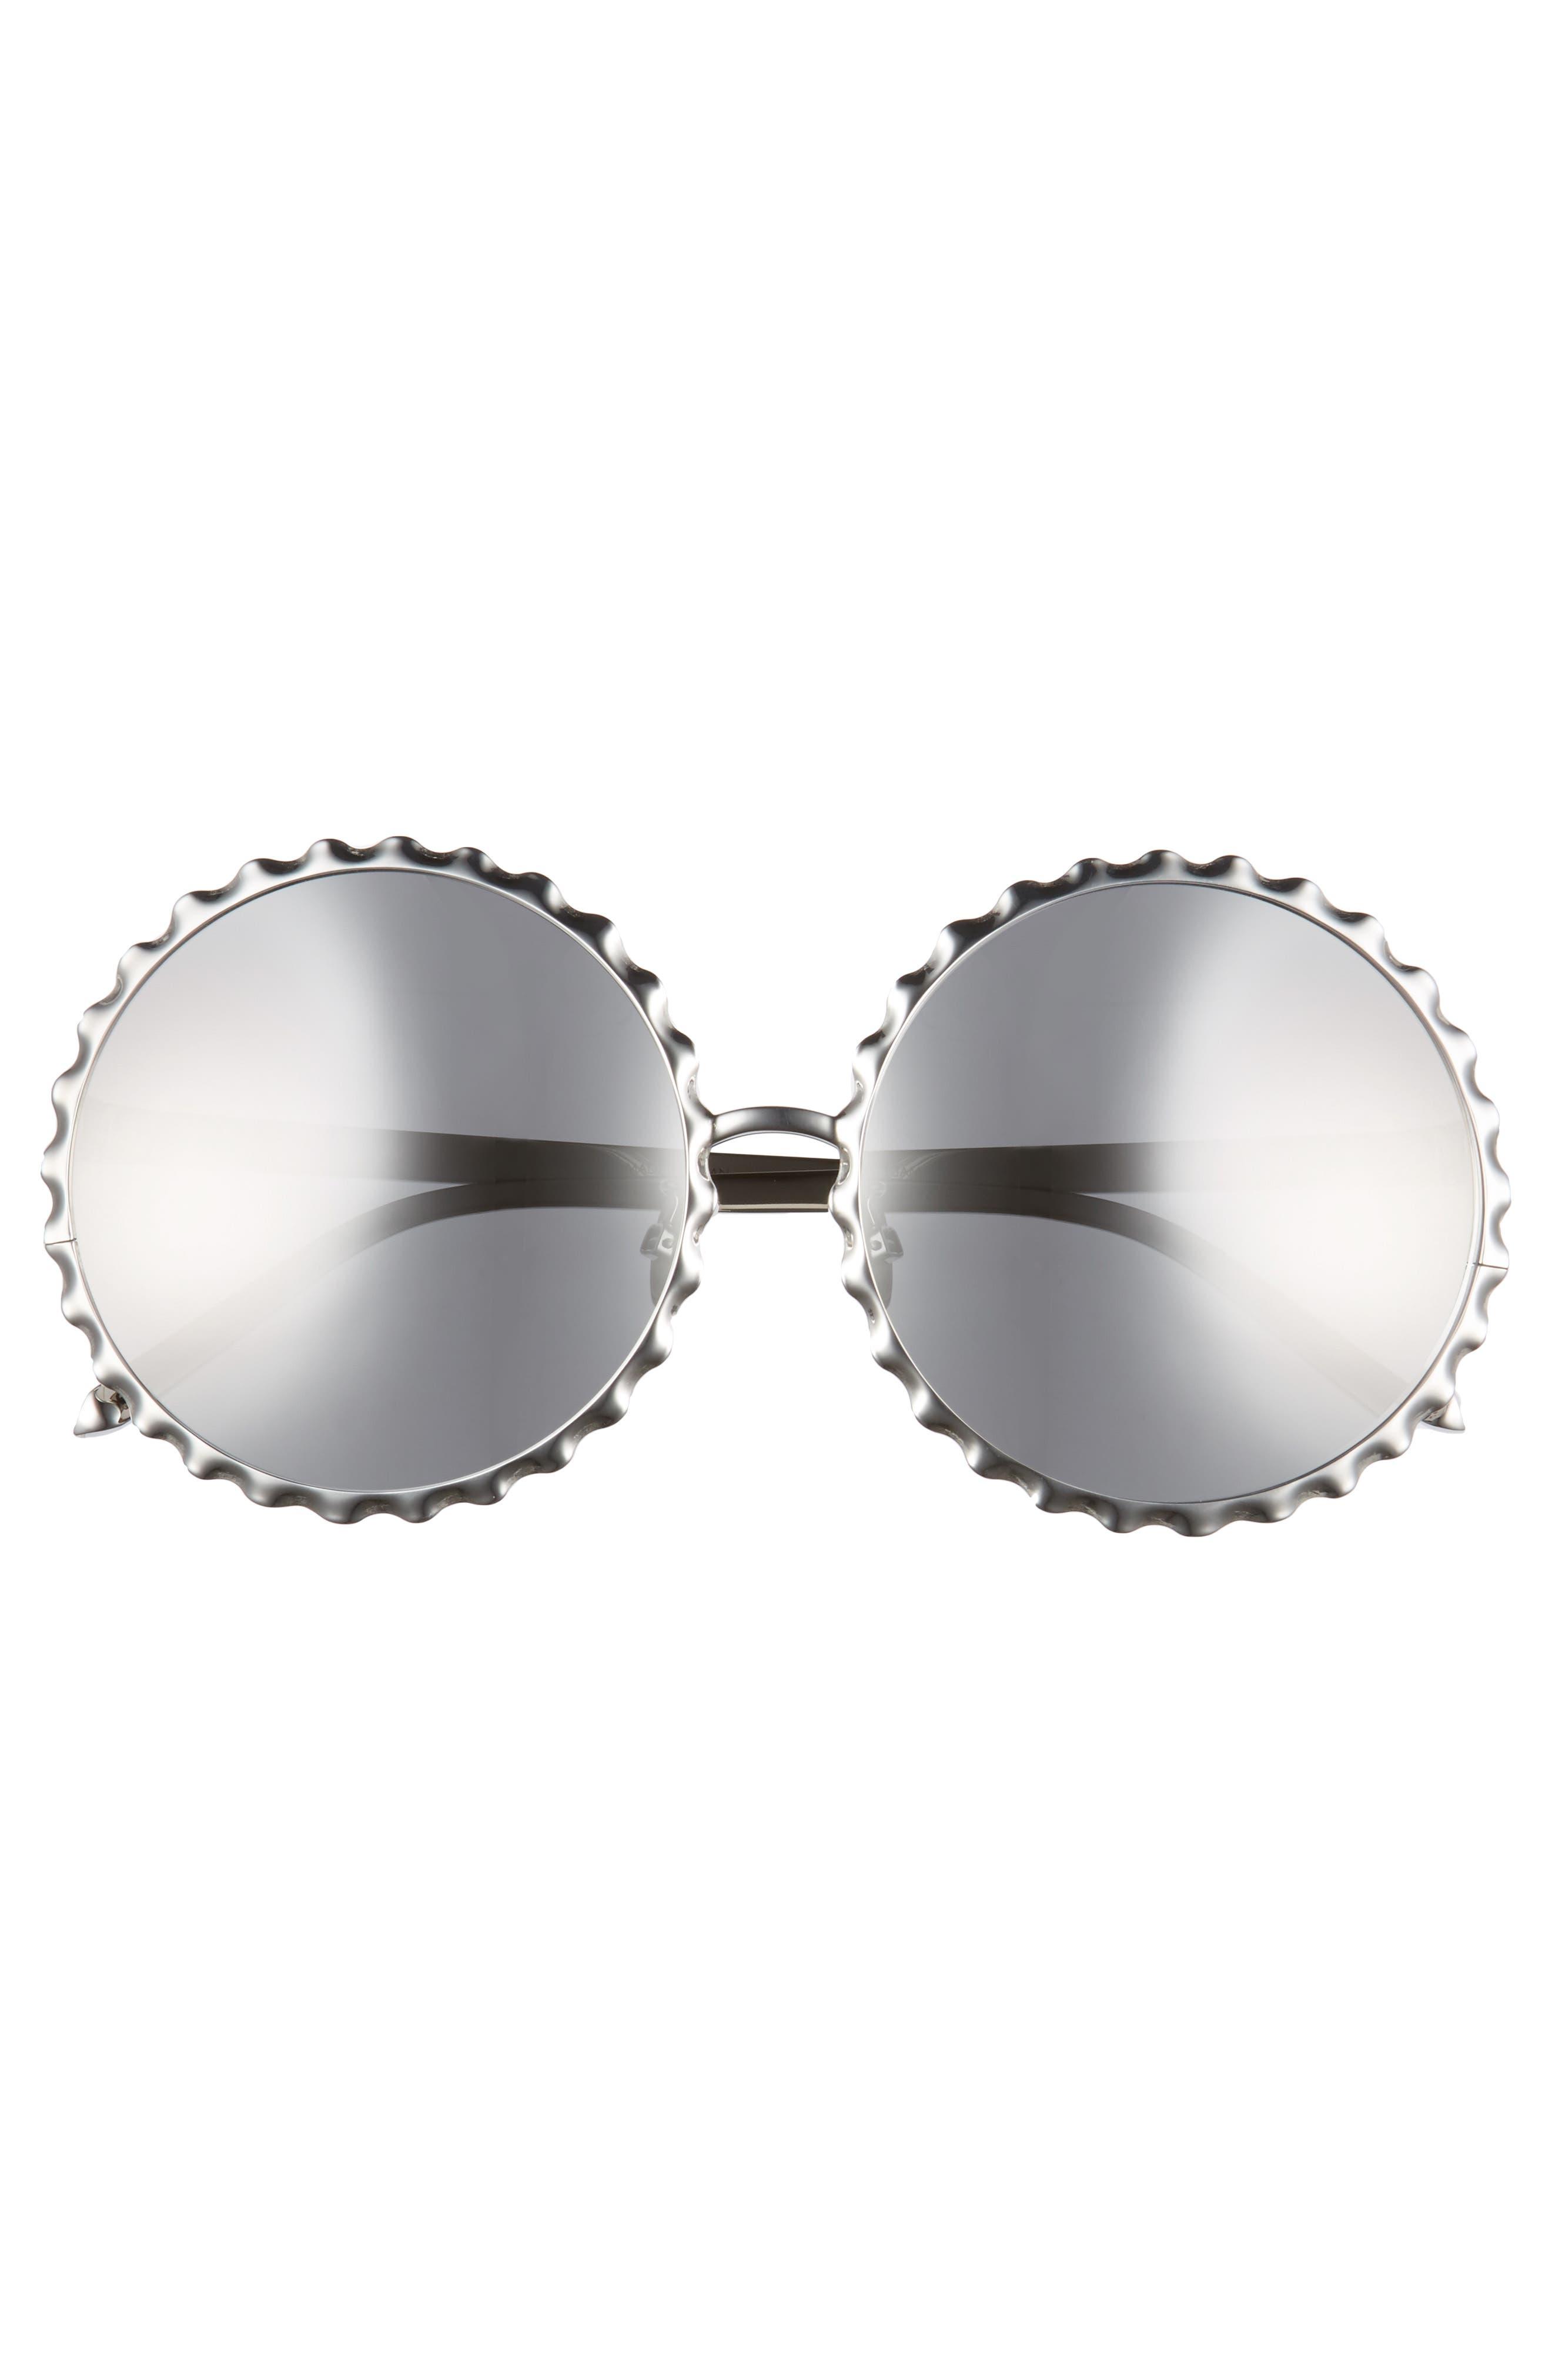 59mm Mirrored 18 Karat Gold Trim Round Sunglasses,                             Alternate thumbnail 3, color,                             White Gold/ Platinum